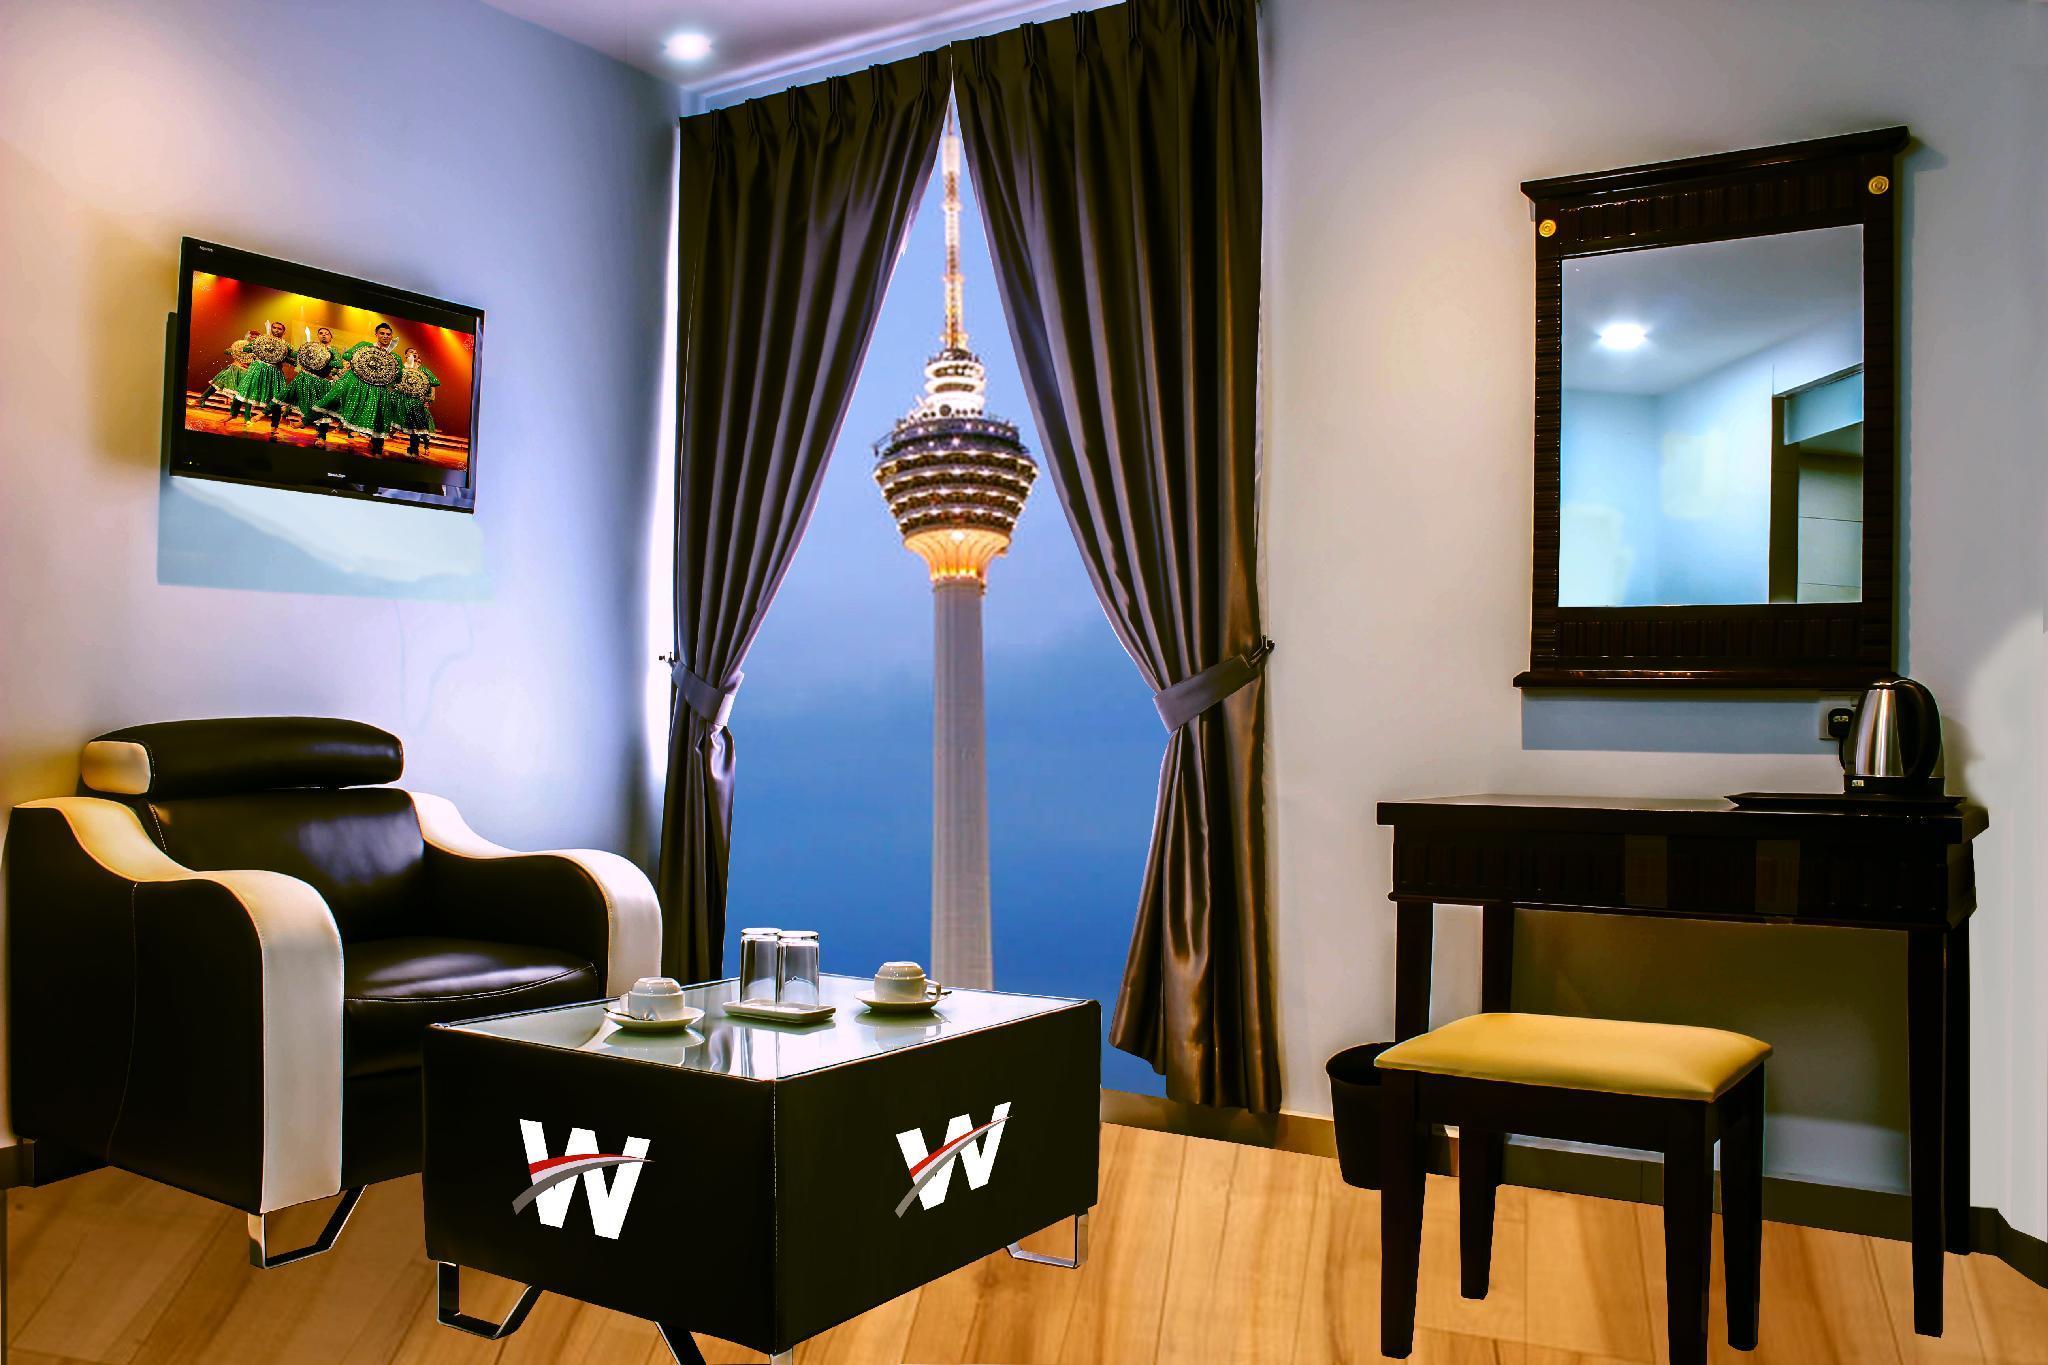 W Hotel, Kuala Lumpur